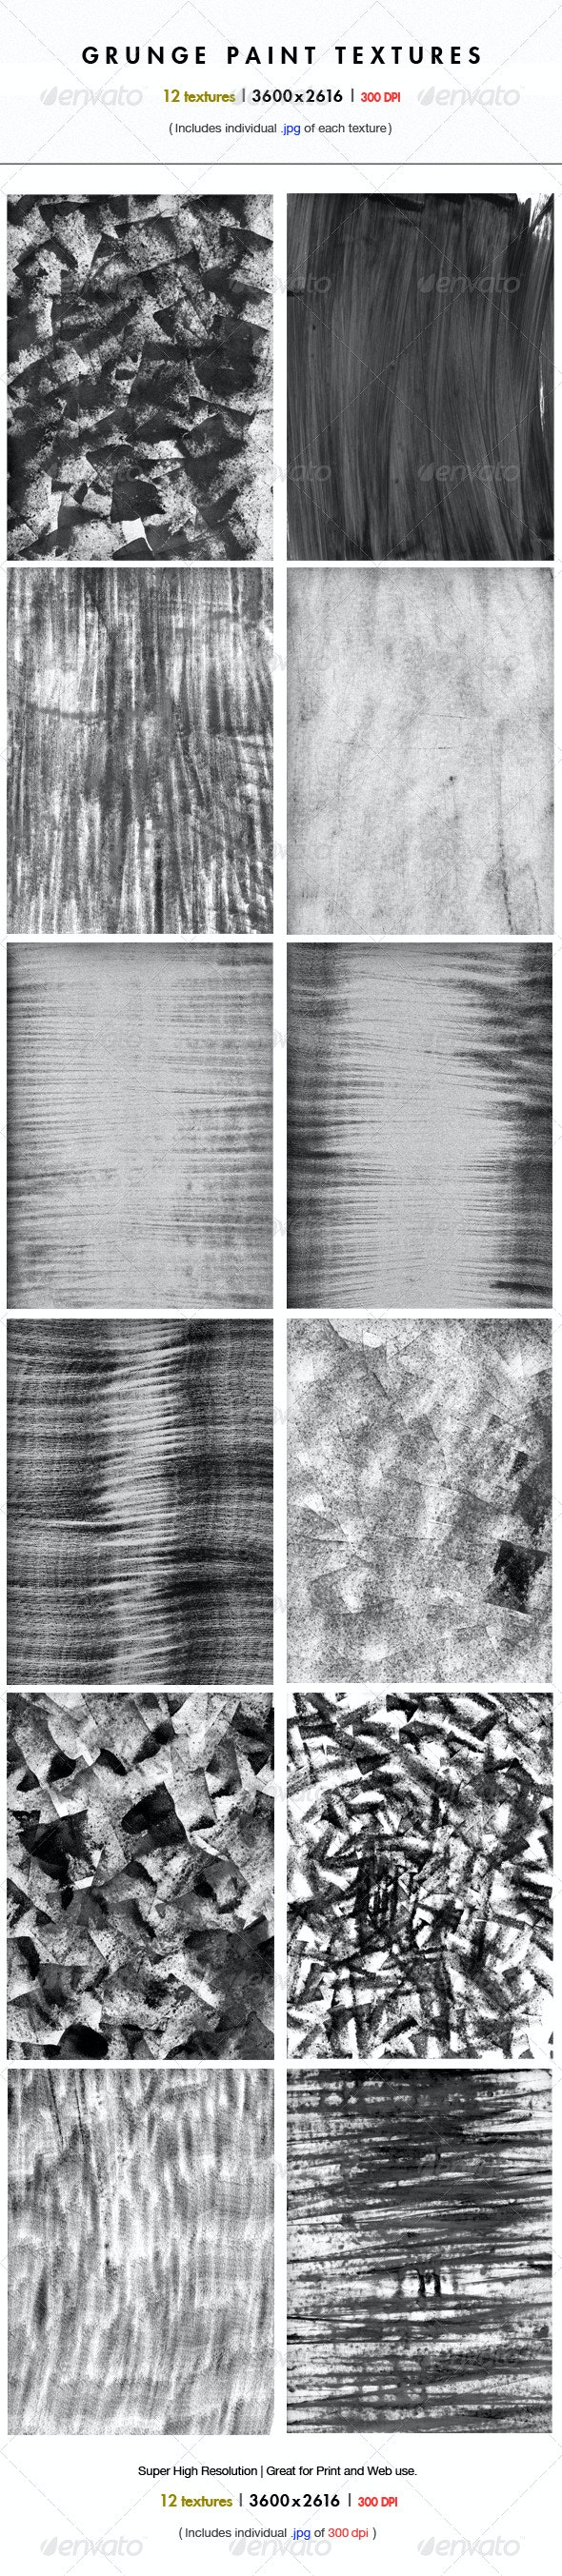 12 High Resolution Grunge Paint Textures - Industrial / Grunge Textures